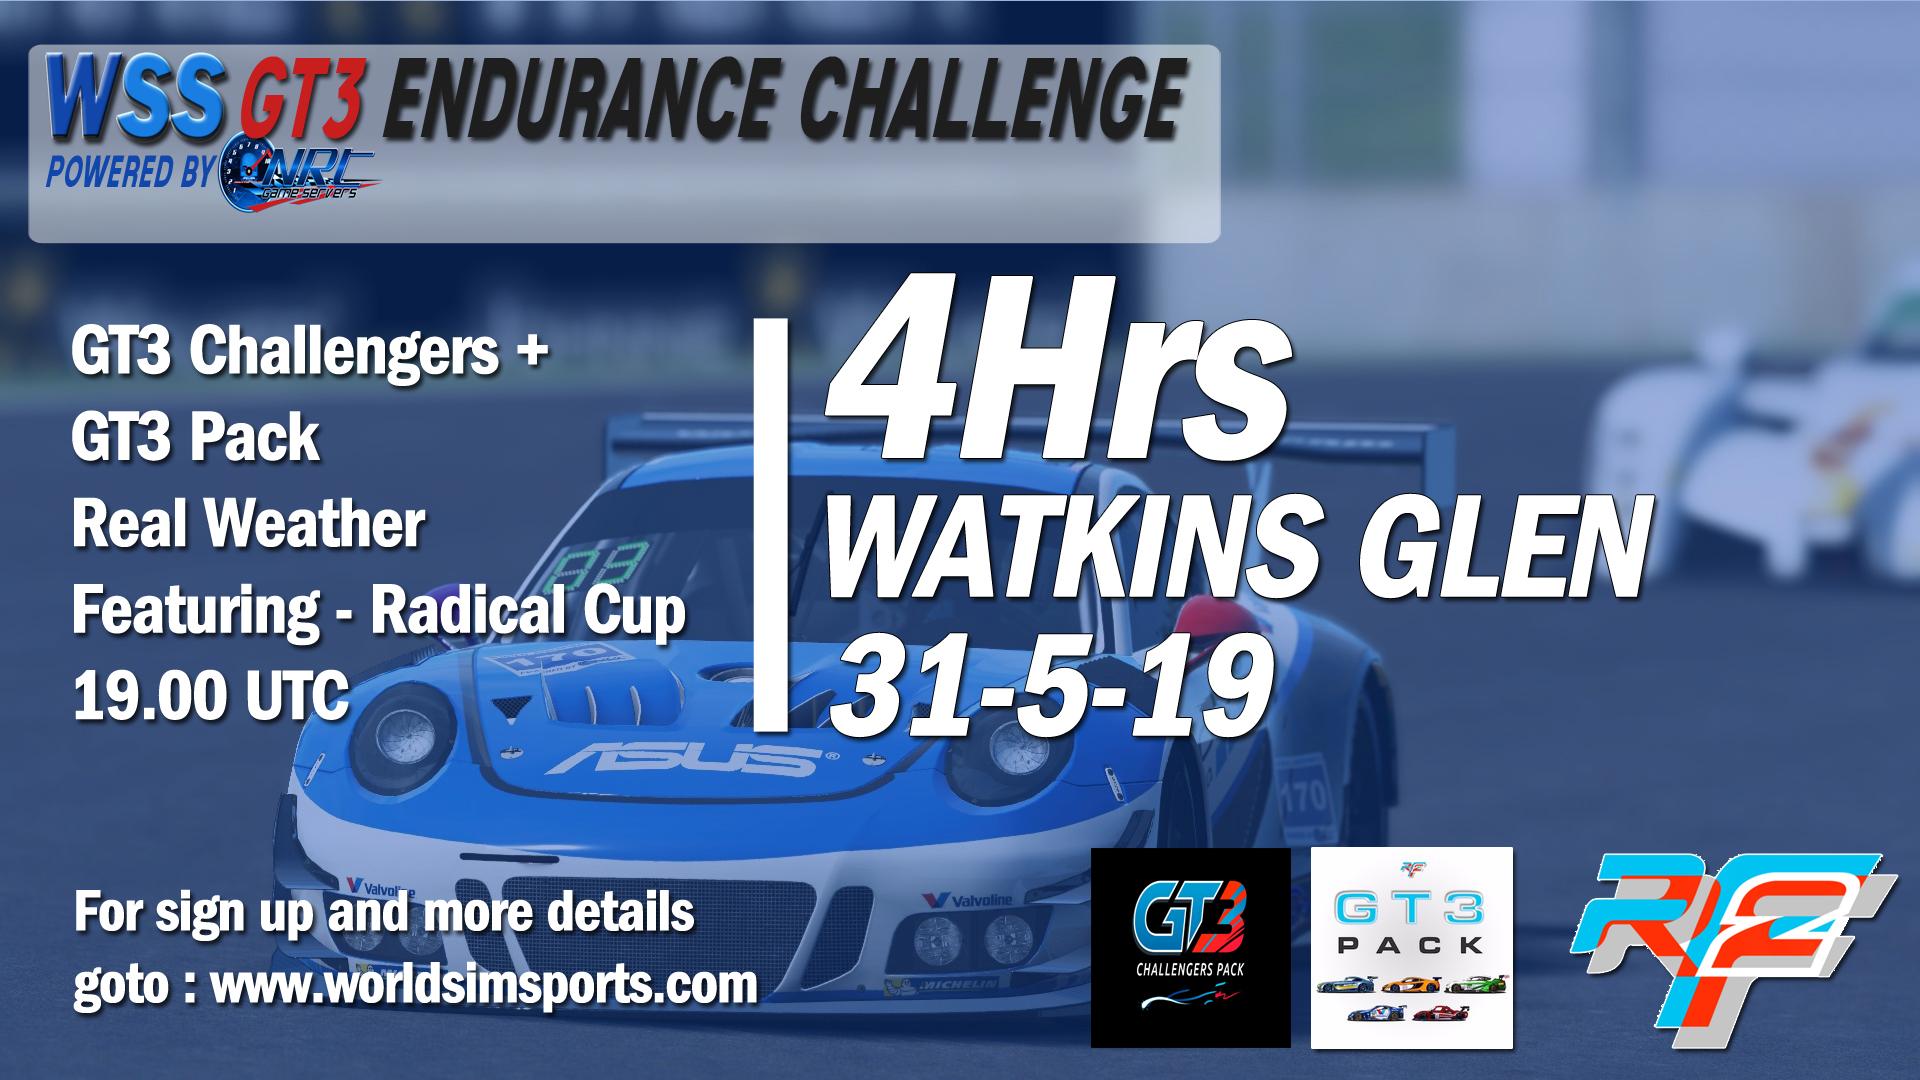 wss gt3 endurance Challenge flyer 2.jpg